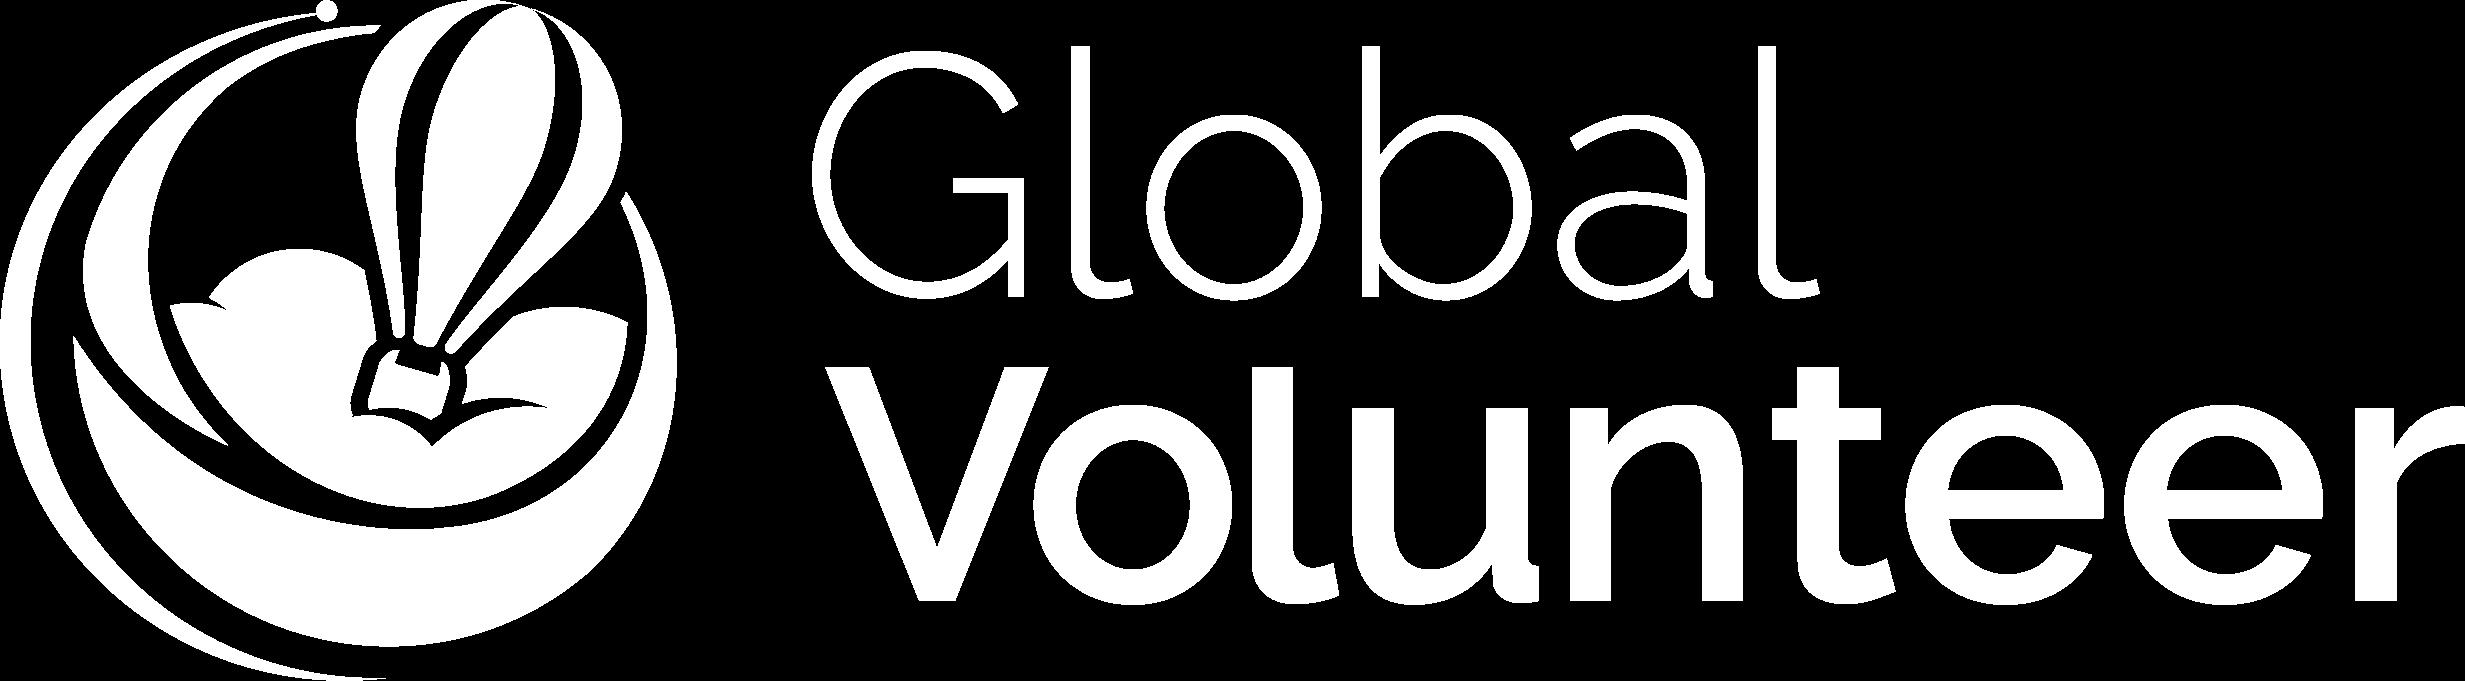 Global Volunteer Freiwilligenprojekte